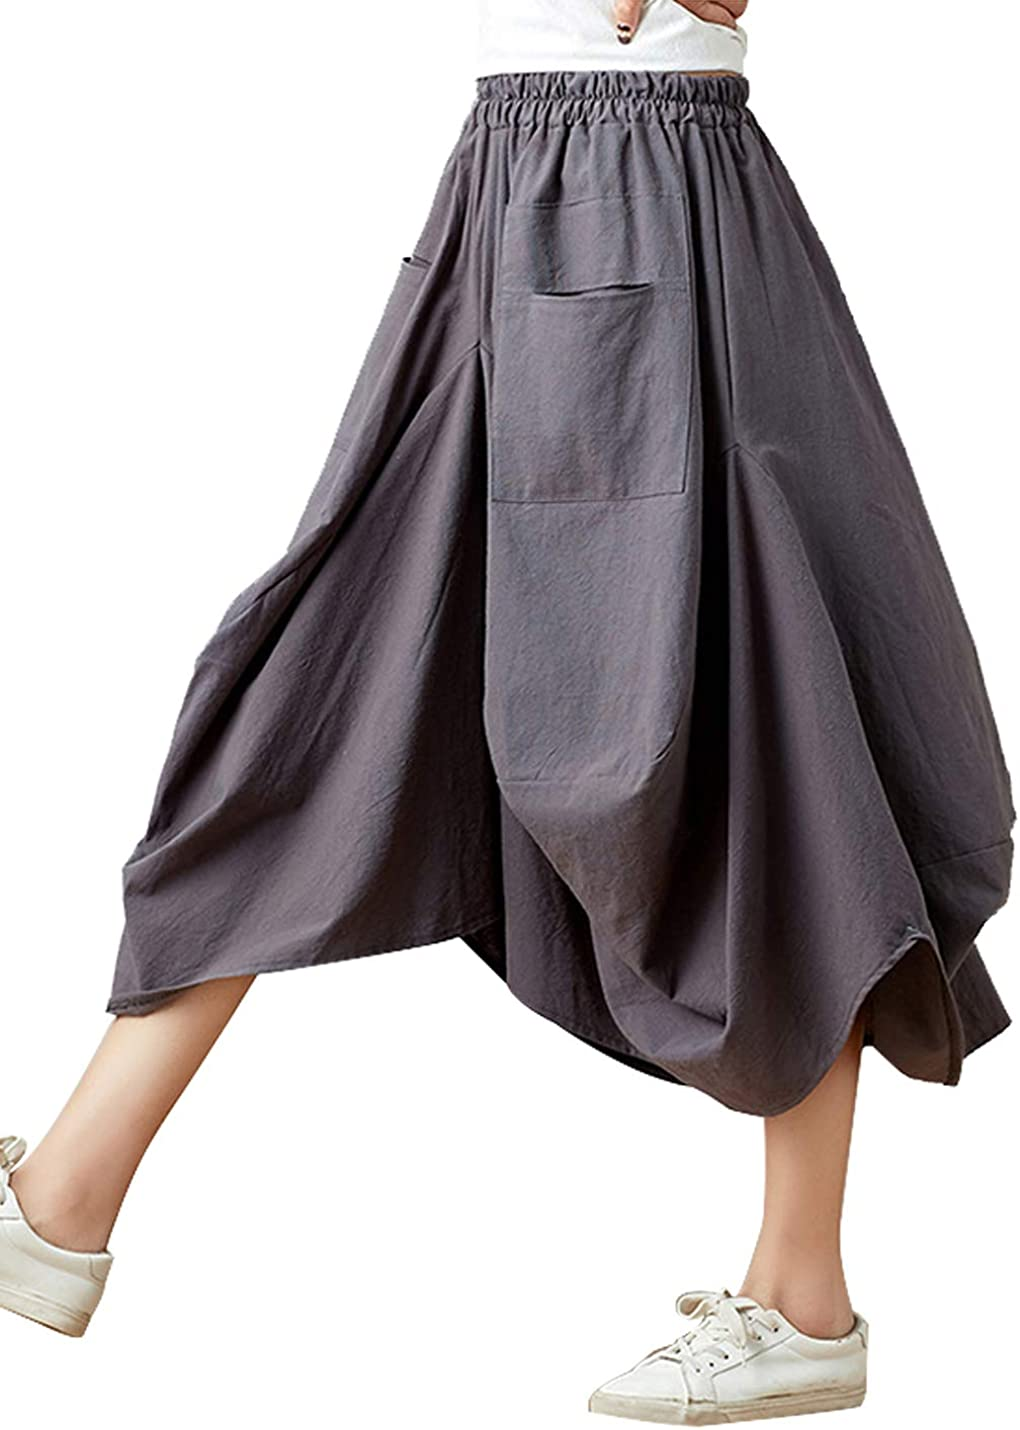 Women Casual Skirts Vintage Linen Cotton High Waisted Summer Midi Skirt